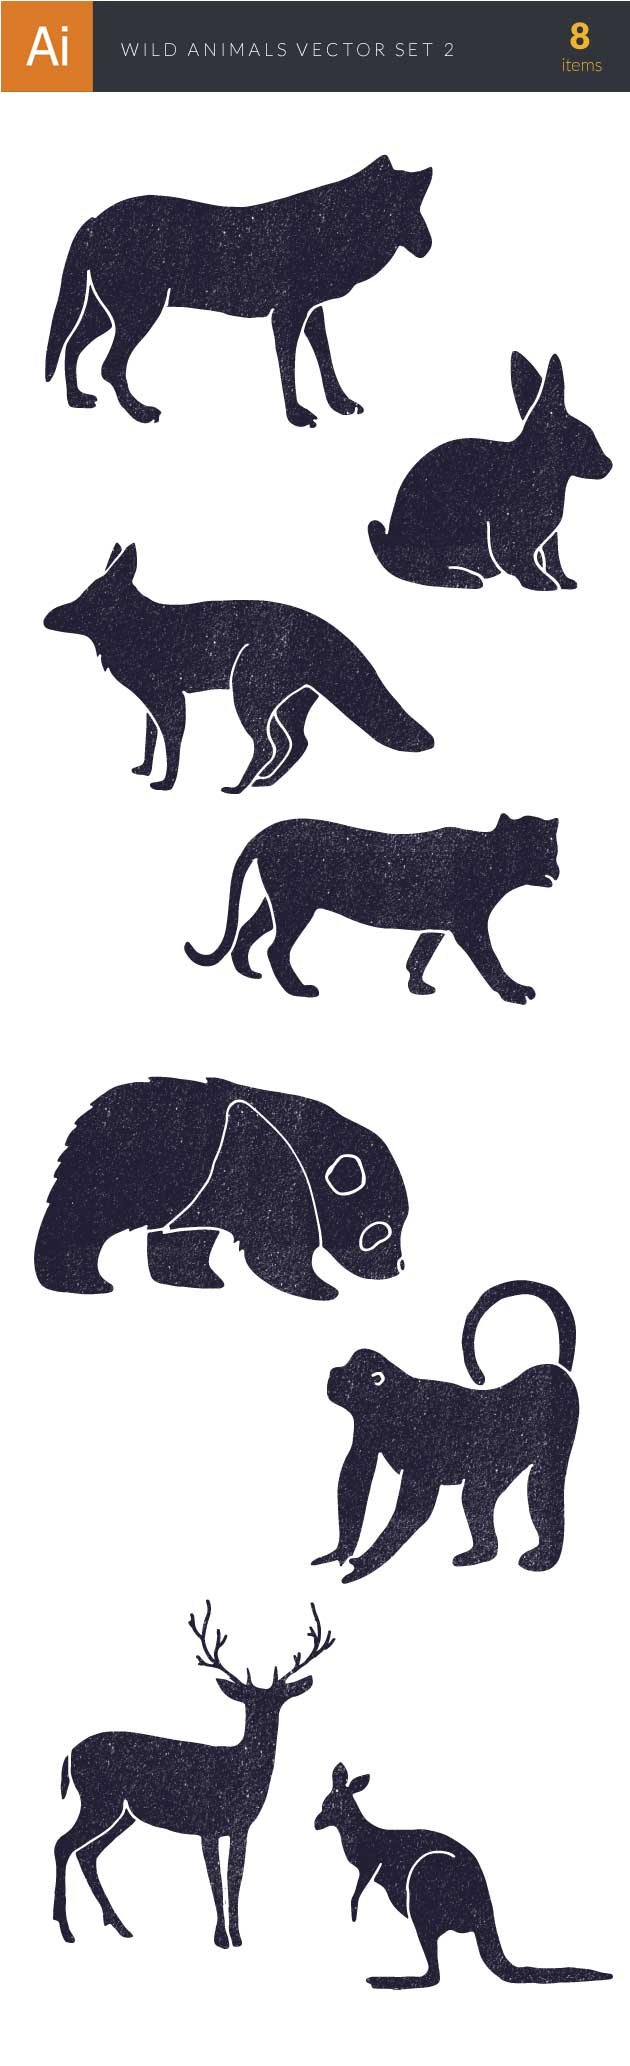 Wild Animals Geometric Vector Set 2 designtnt wild animals geometric vector set 2 vector large